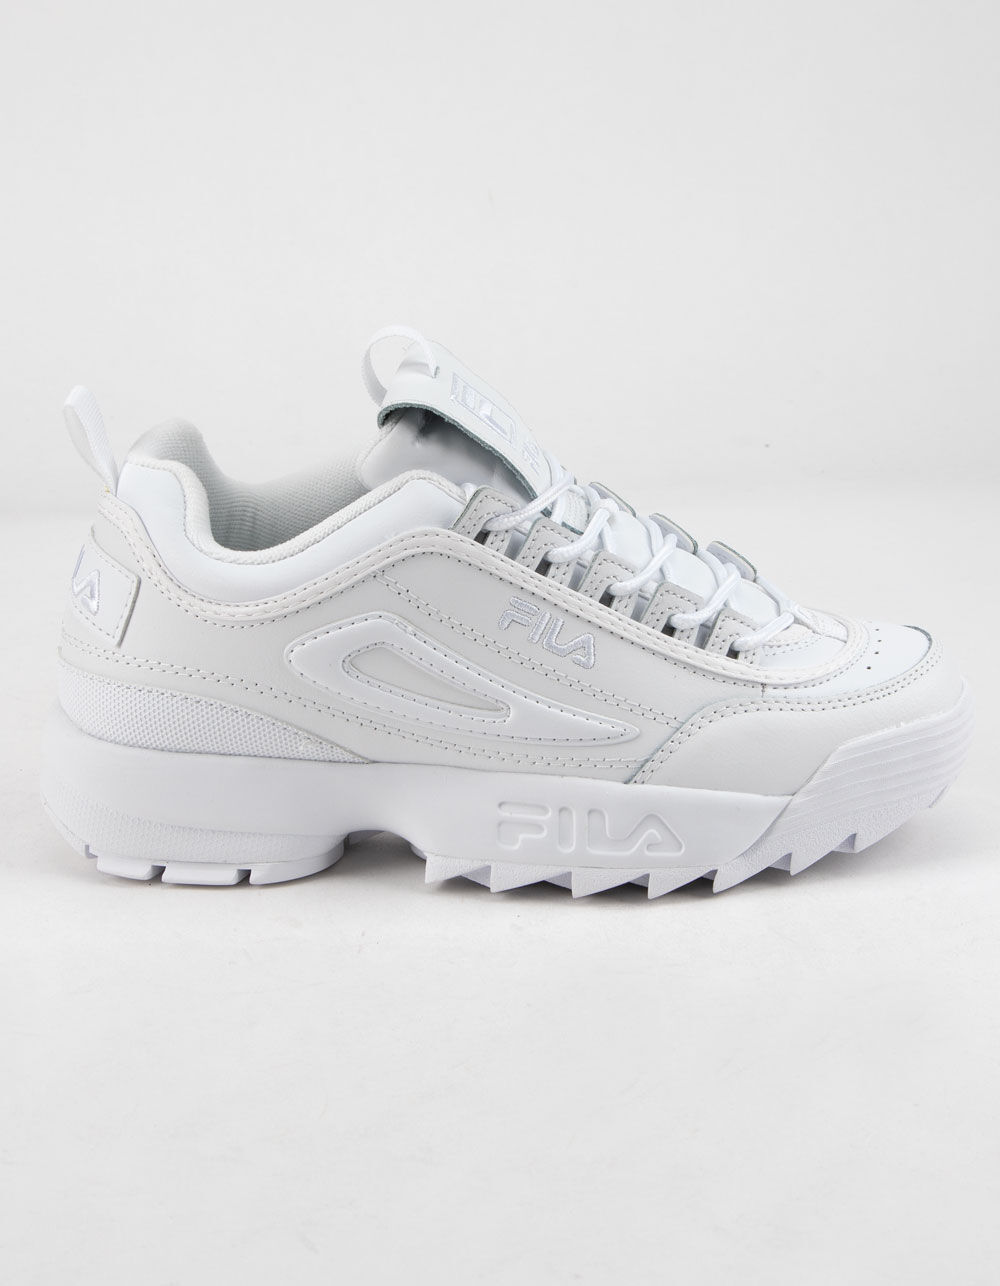 FILA Disruptor 2 Premium White Shoes